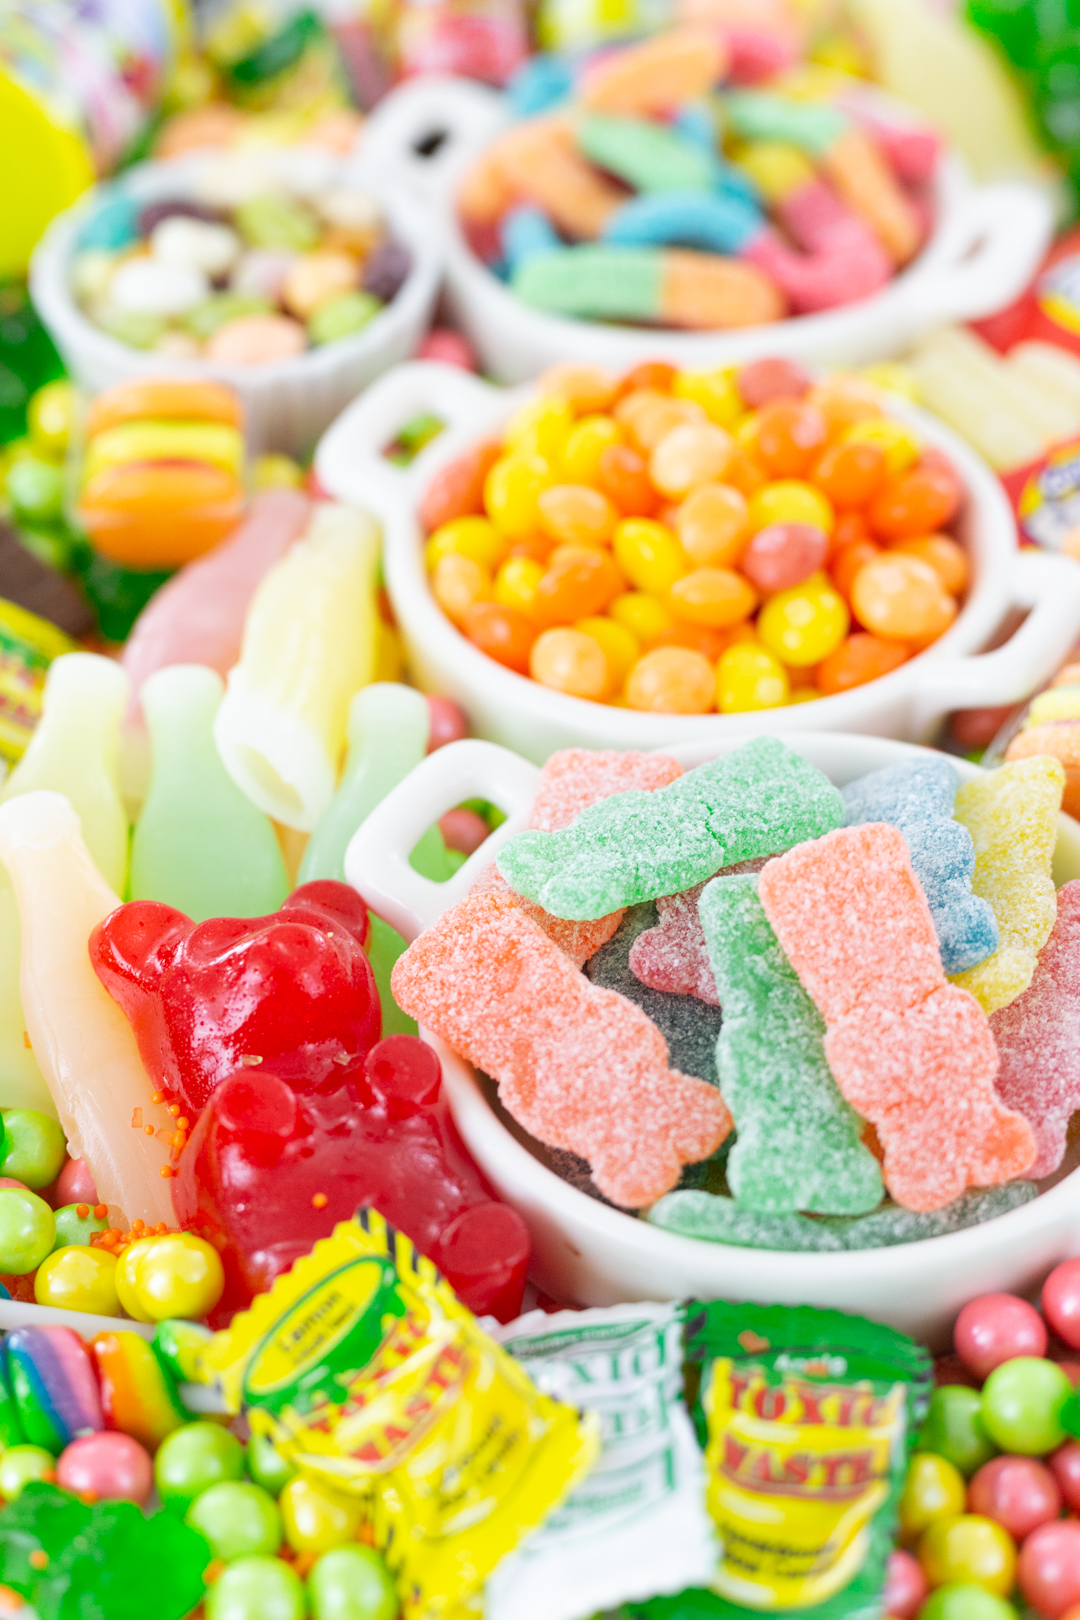 cutest big gummy bear and toxic waste candy